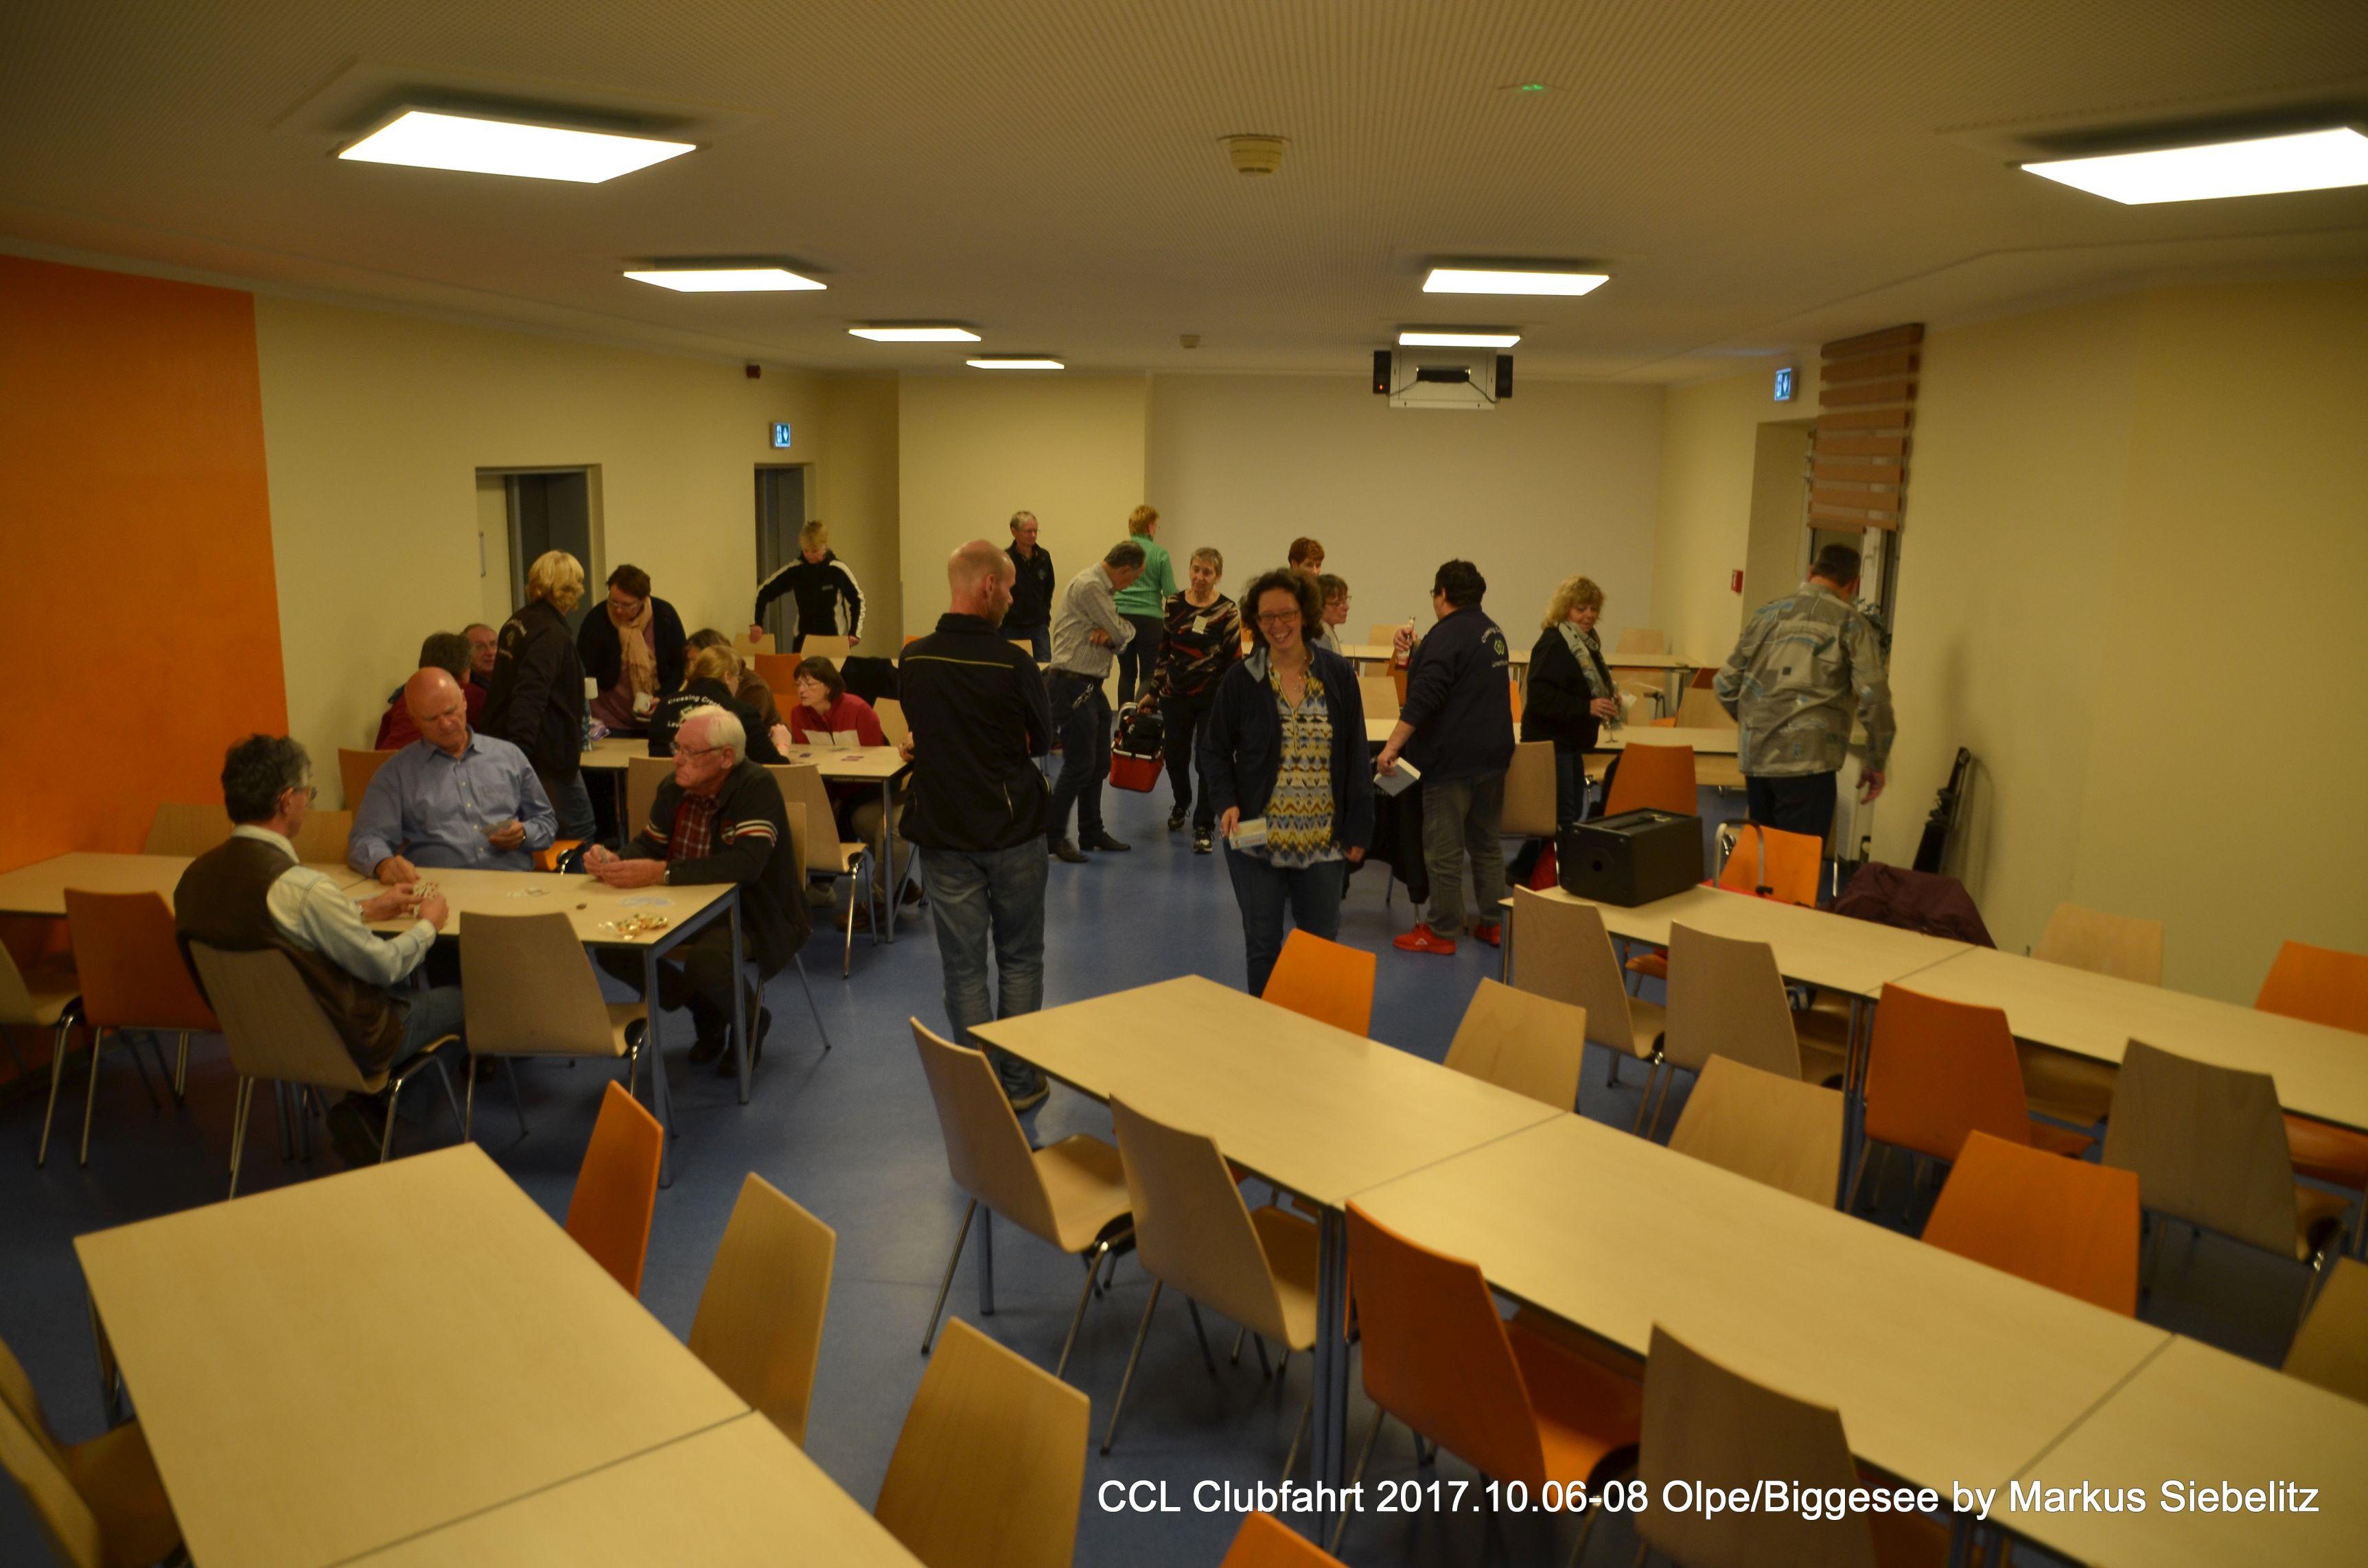 CCL Clubfahrt 2017.10.06-08 Biggesee (1)